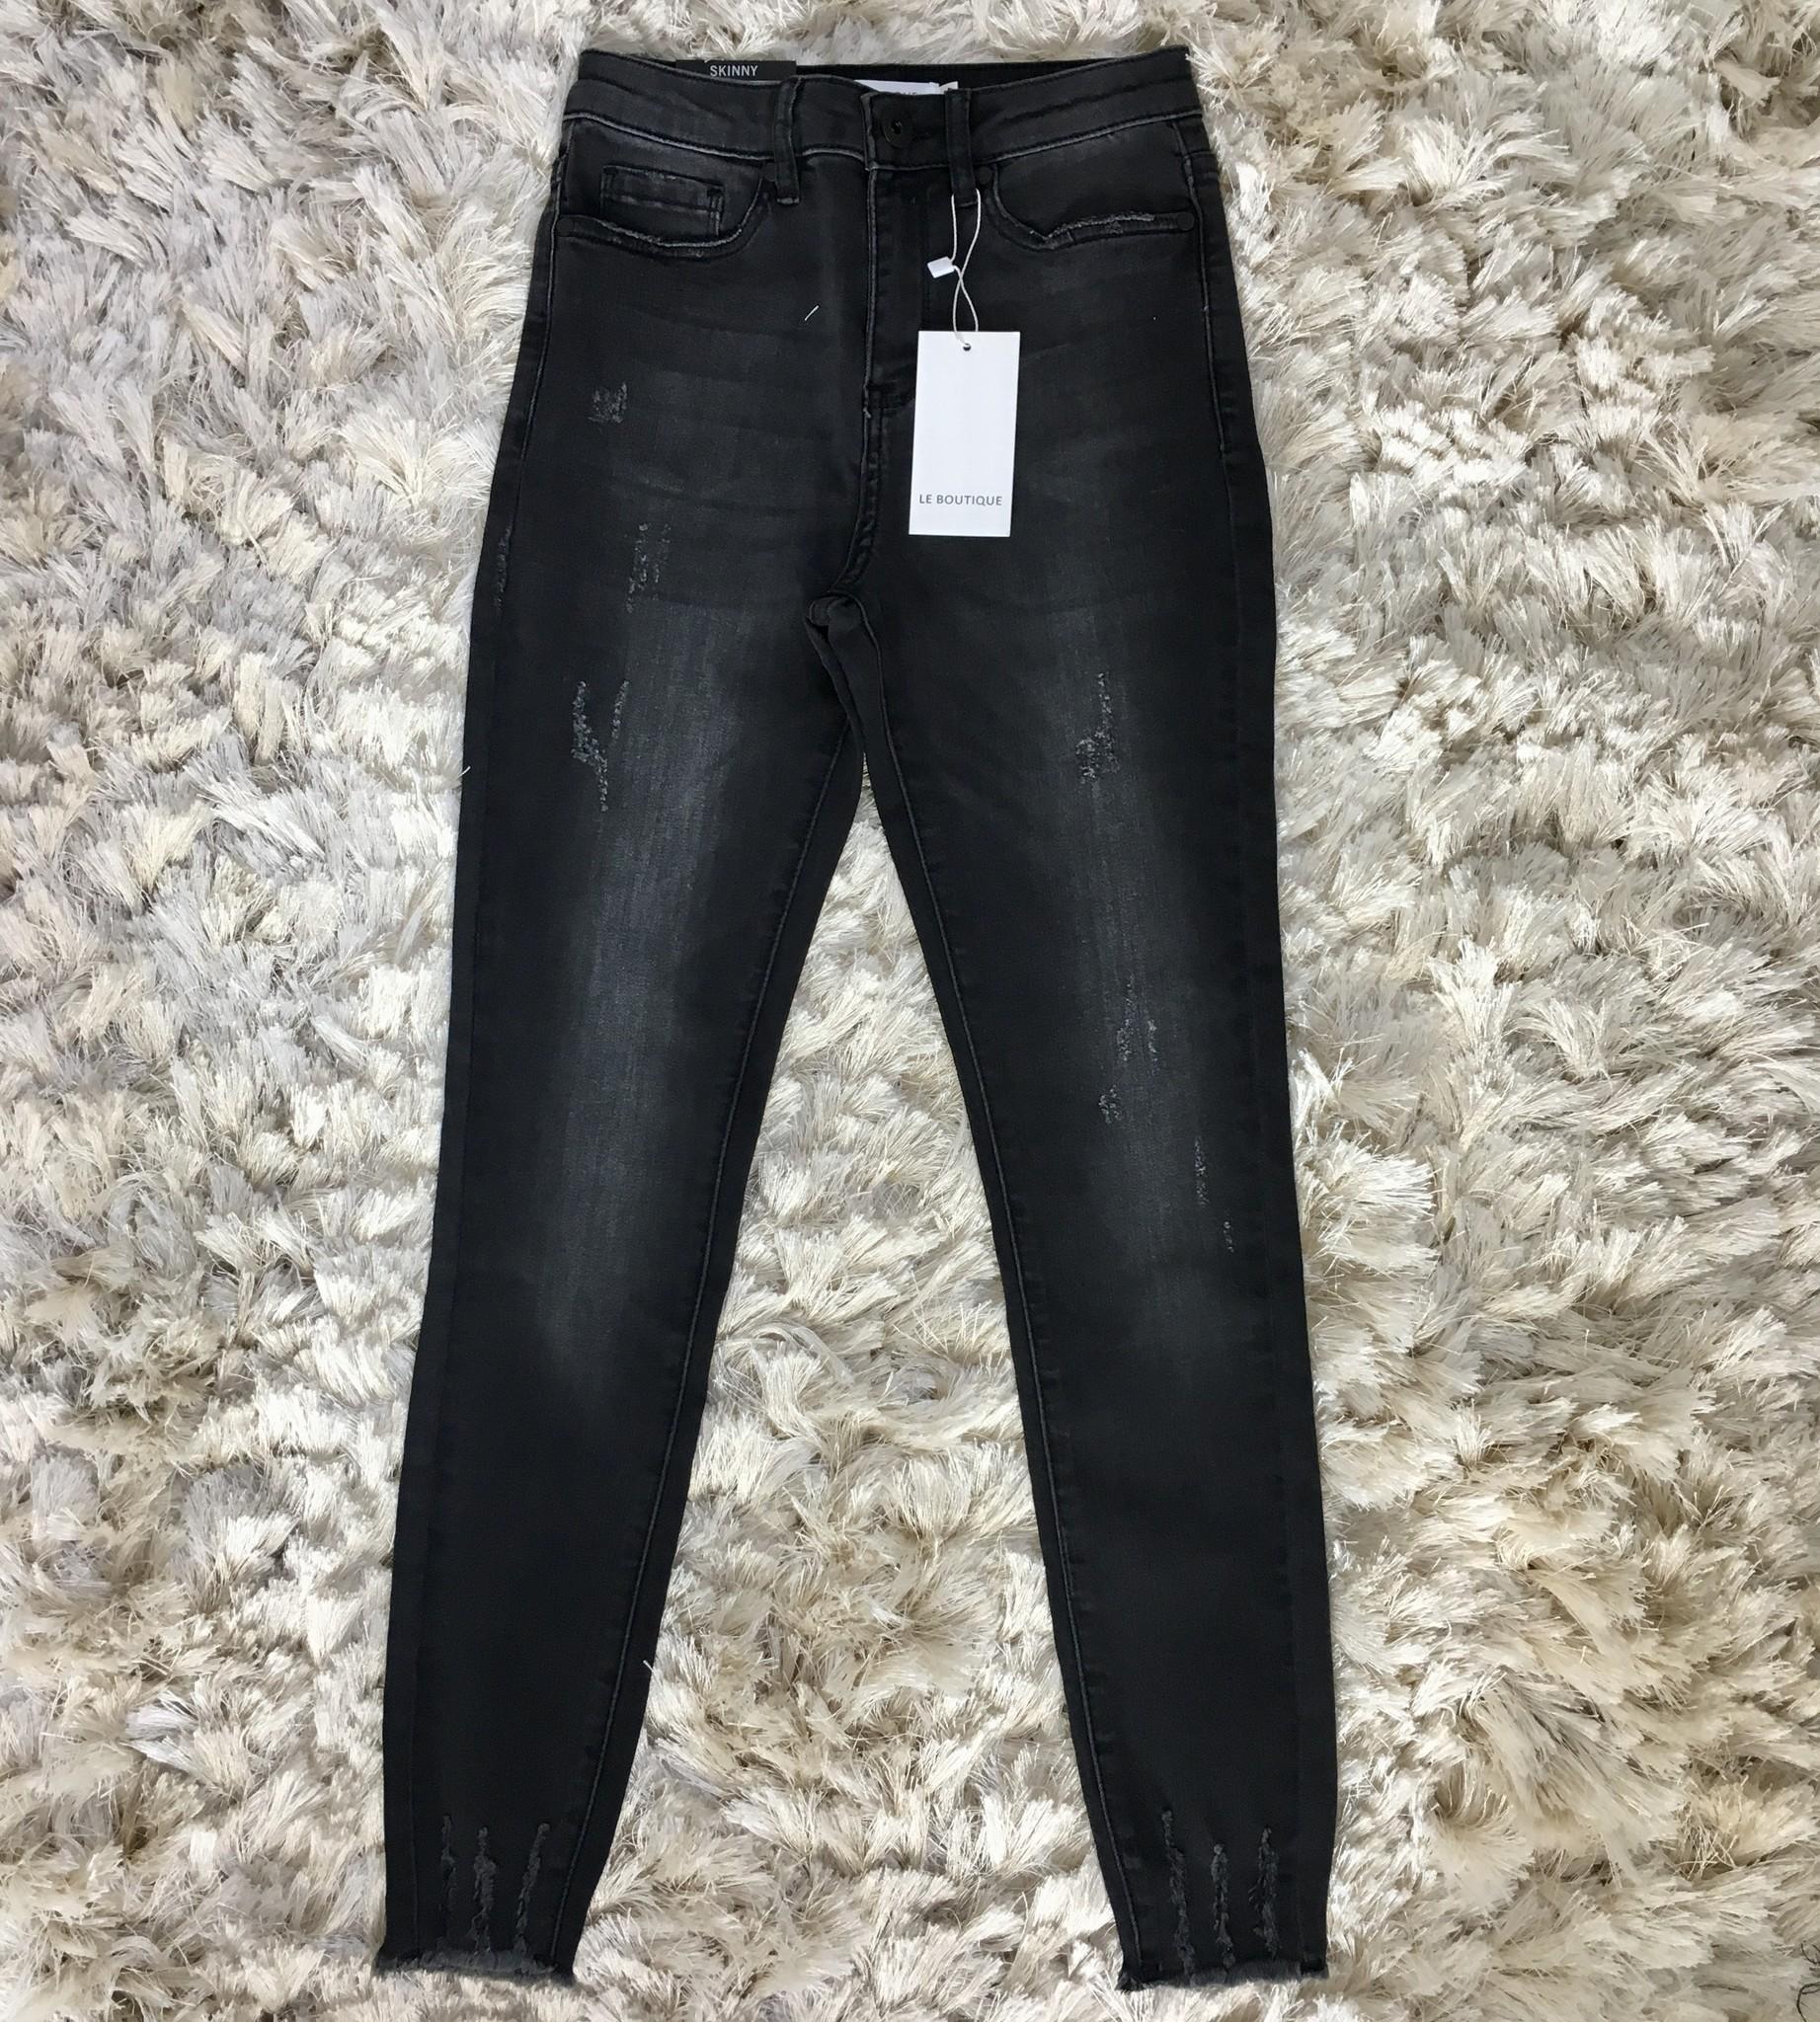 Ripped jeans sanremo black